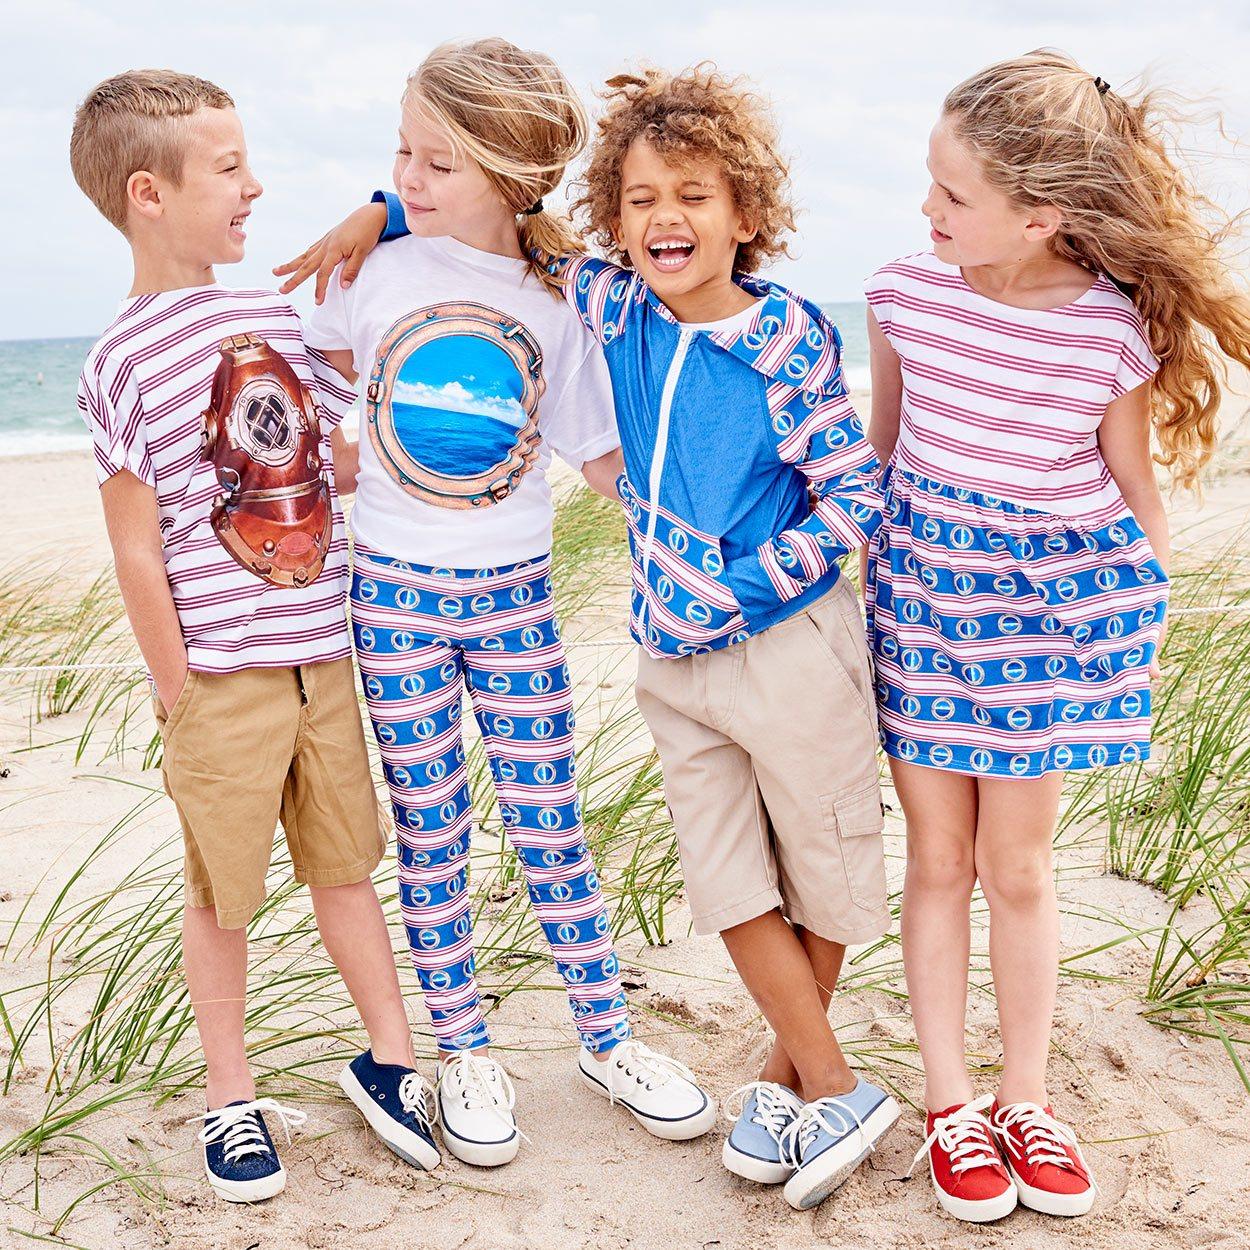 Modern Mariner Hybrid Zip Up Hoodie Upf50 Kids Boys Girls 2 12 Red White Blue Stripes Denim Portholes Unisex Wo Boys And Two Girls On The Beach Sunpoplife